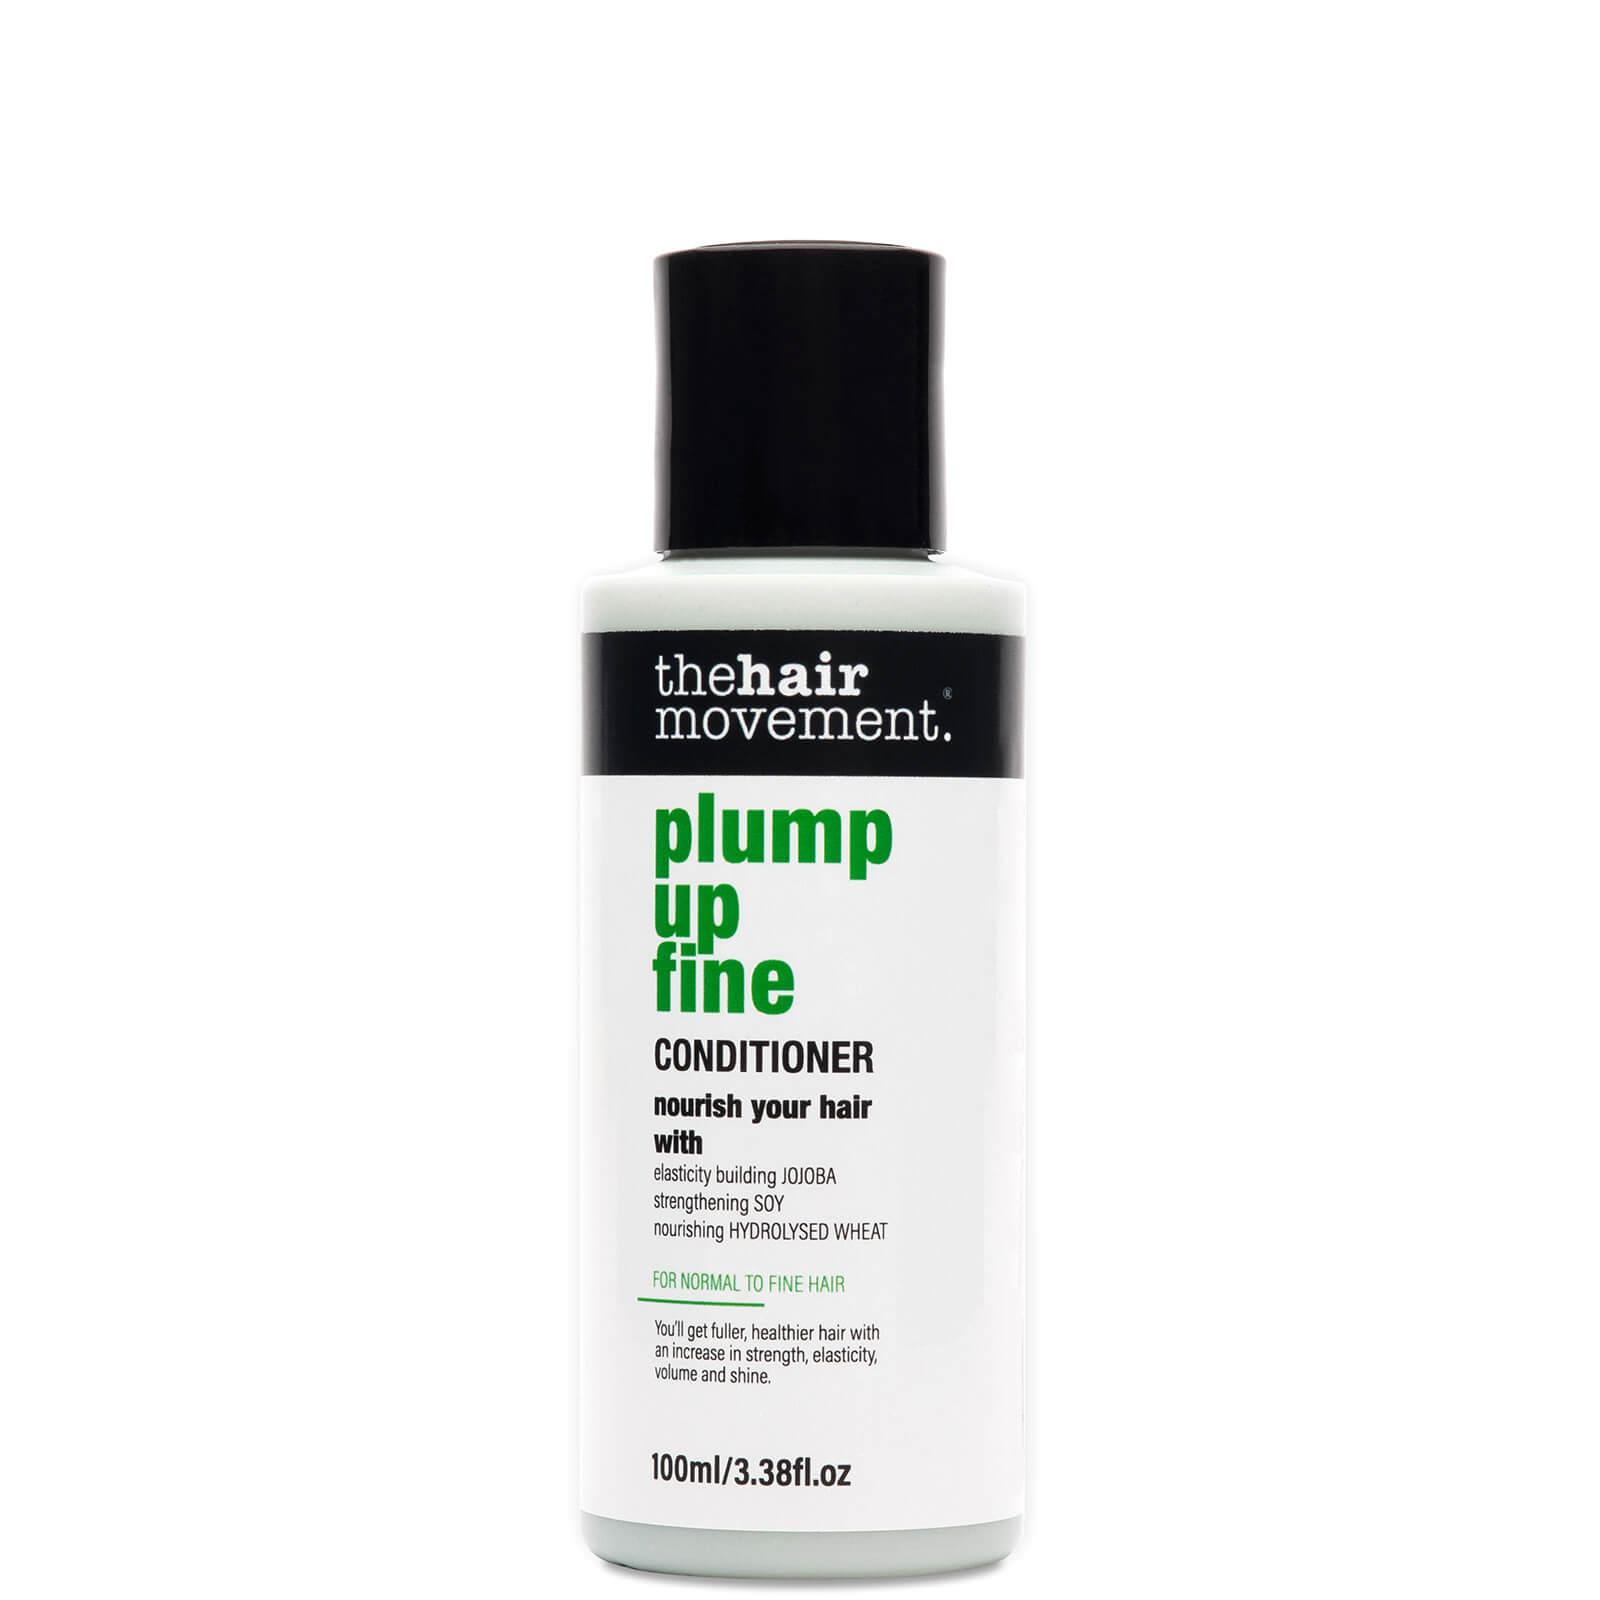 Купить The Hair Movement Plump Up Fine Conditioner 100ml